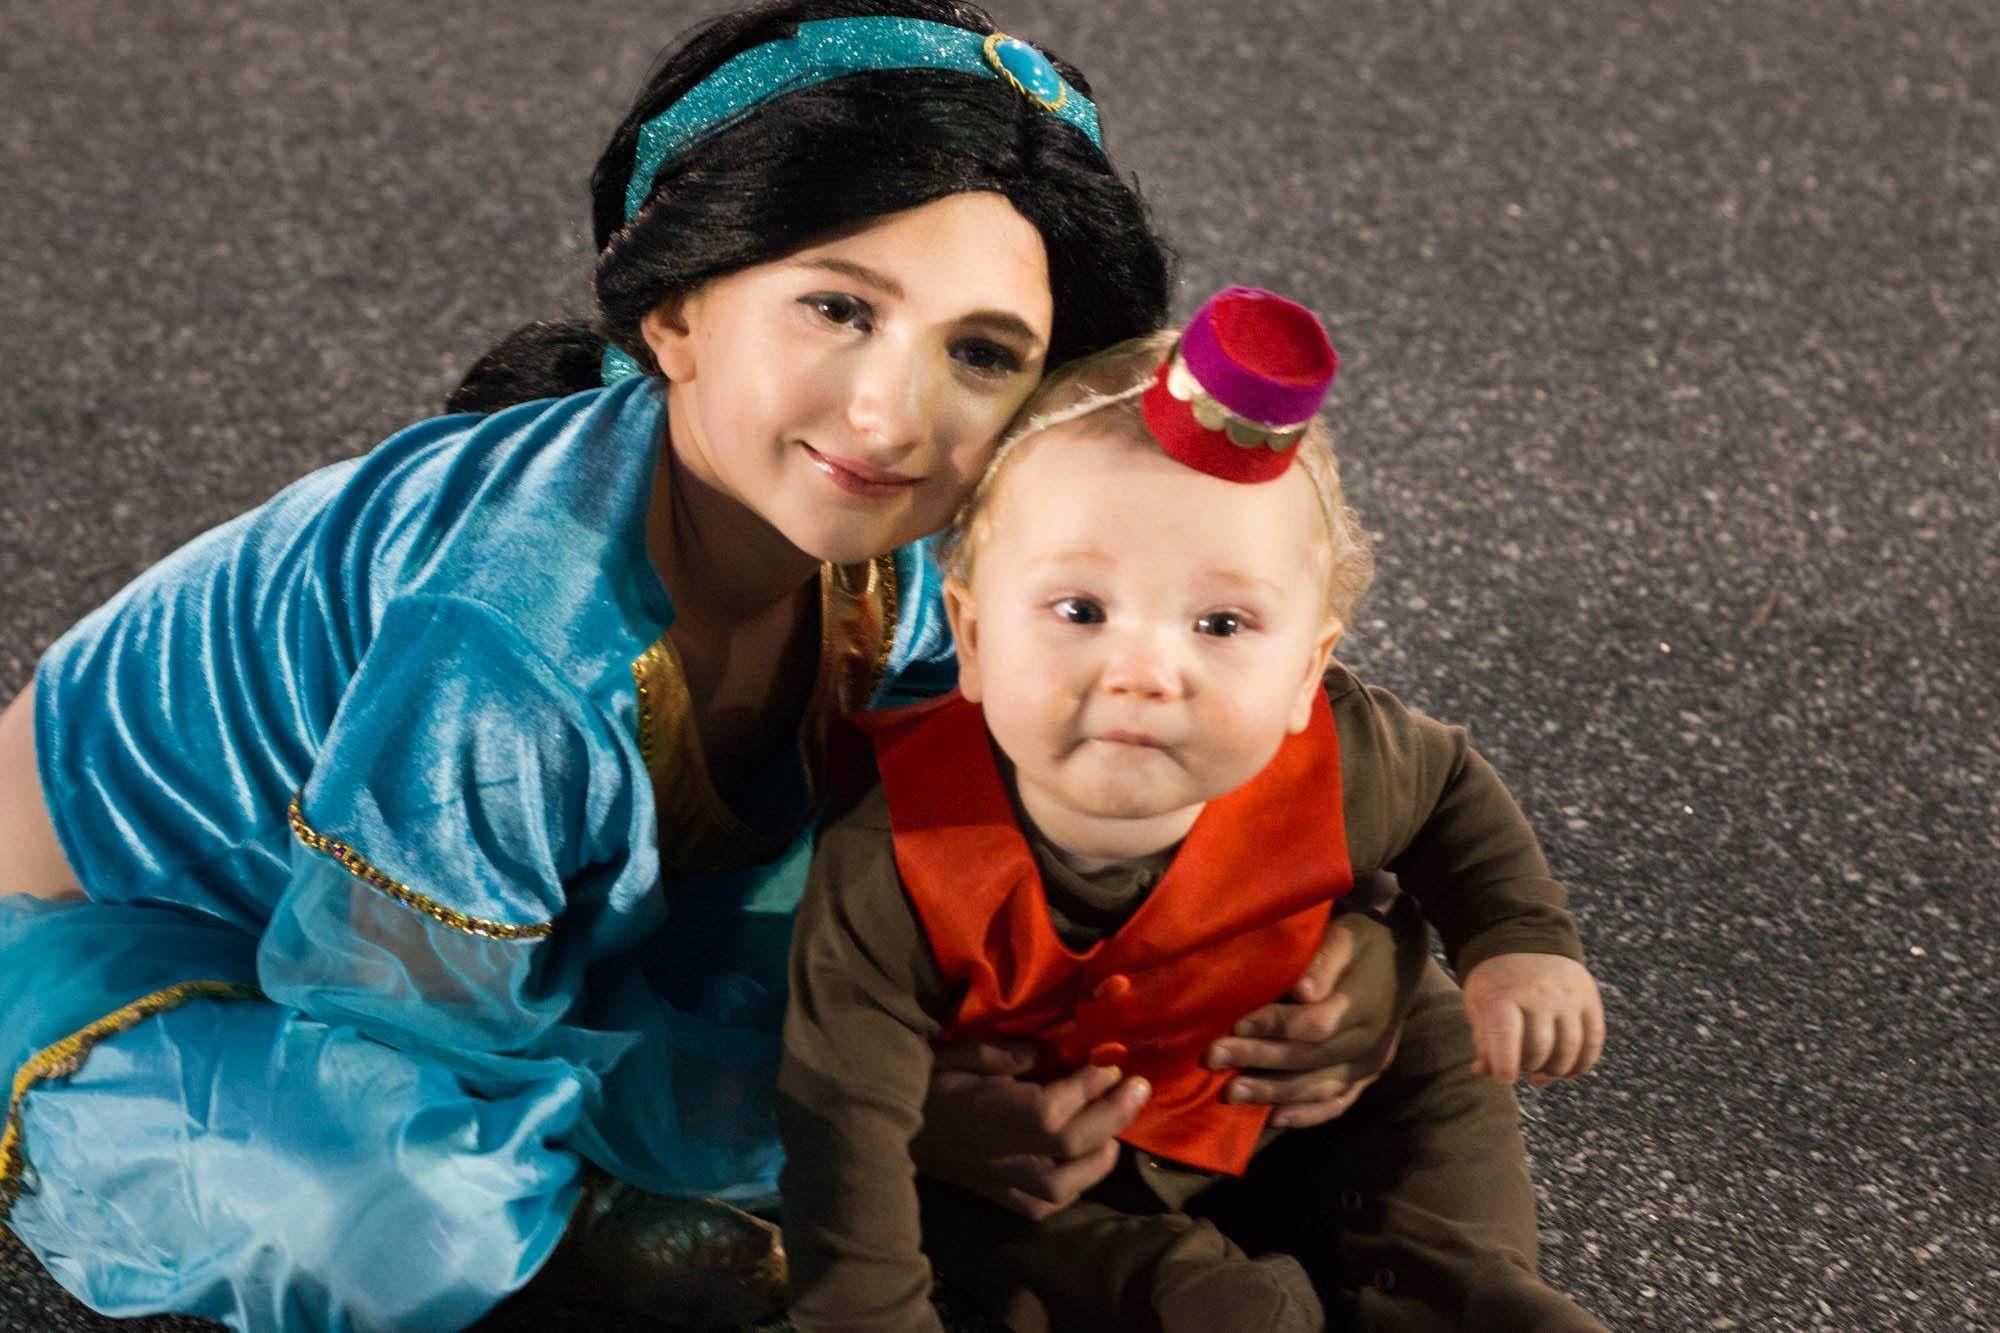 Disney aladdin jasmine and abu halloween costumes pinterest